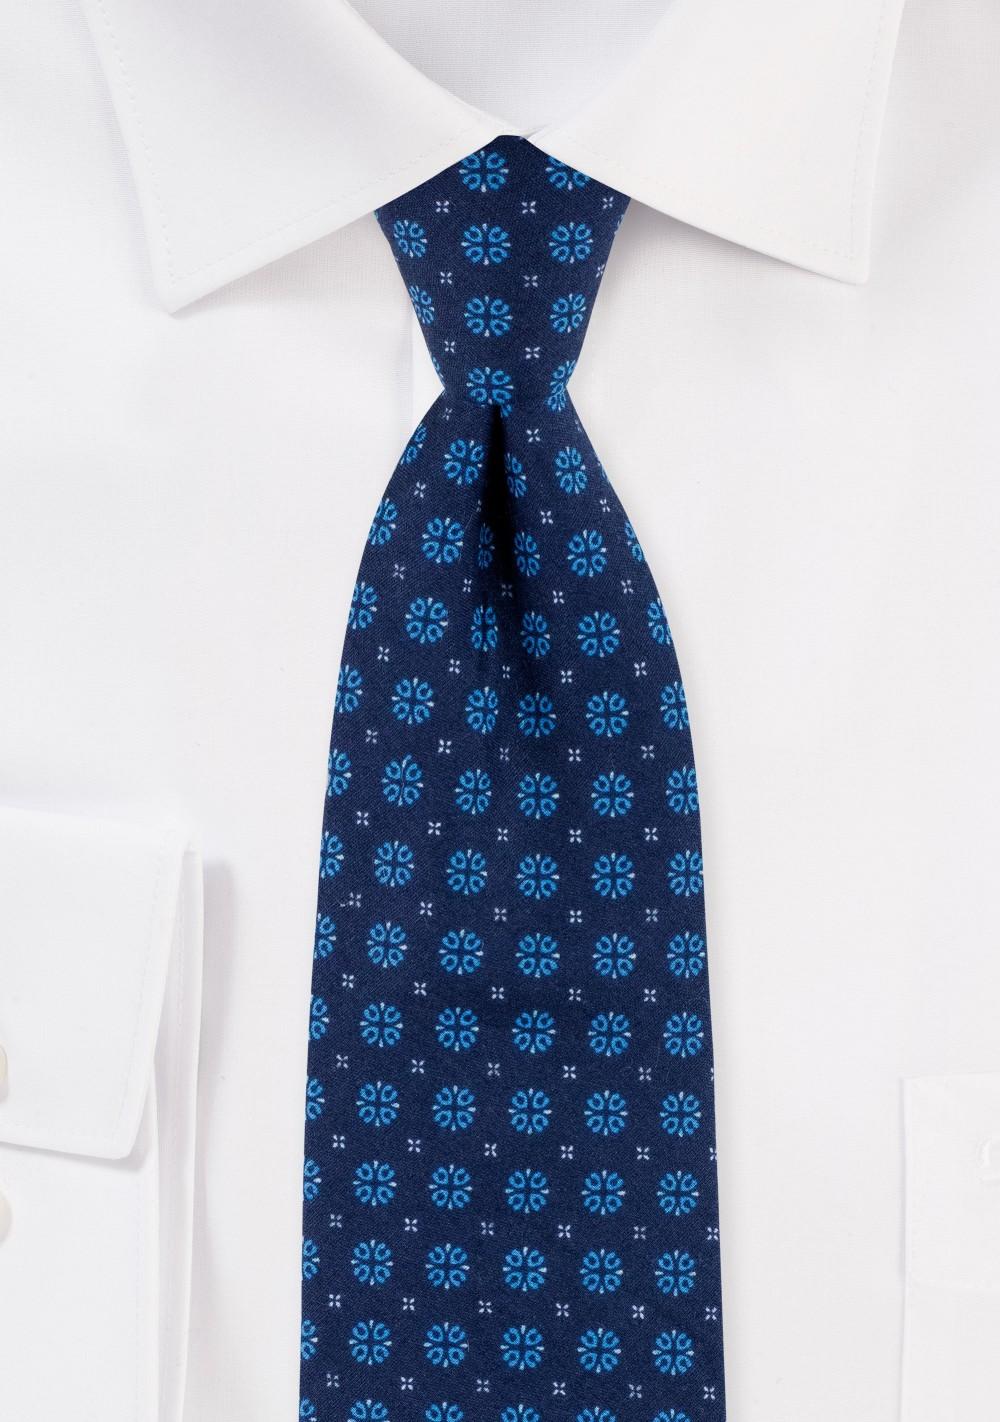 Slim Cut Cotton Tie in Navy with Geometric Design Print